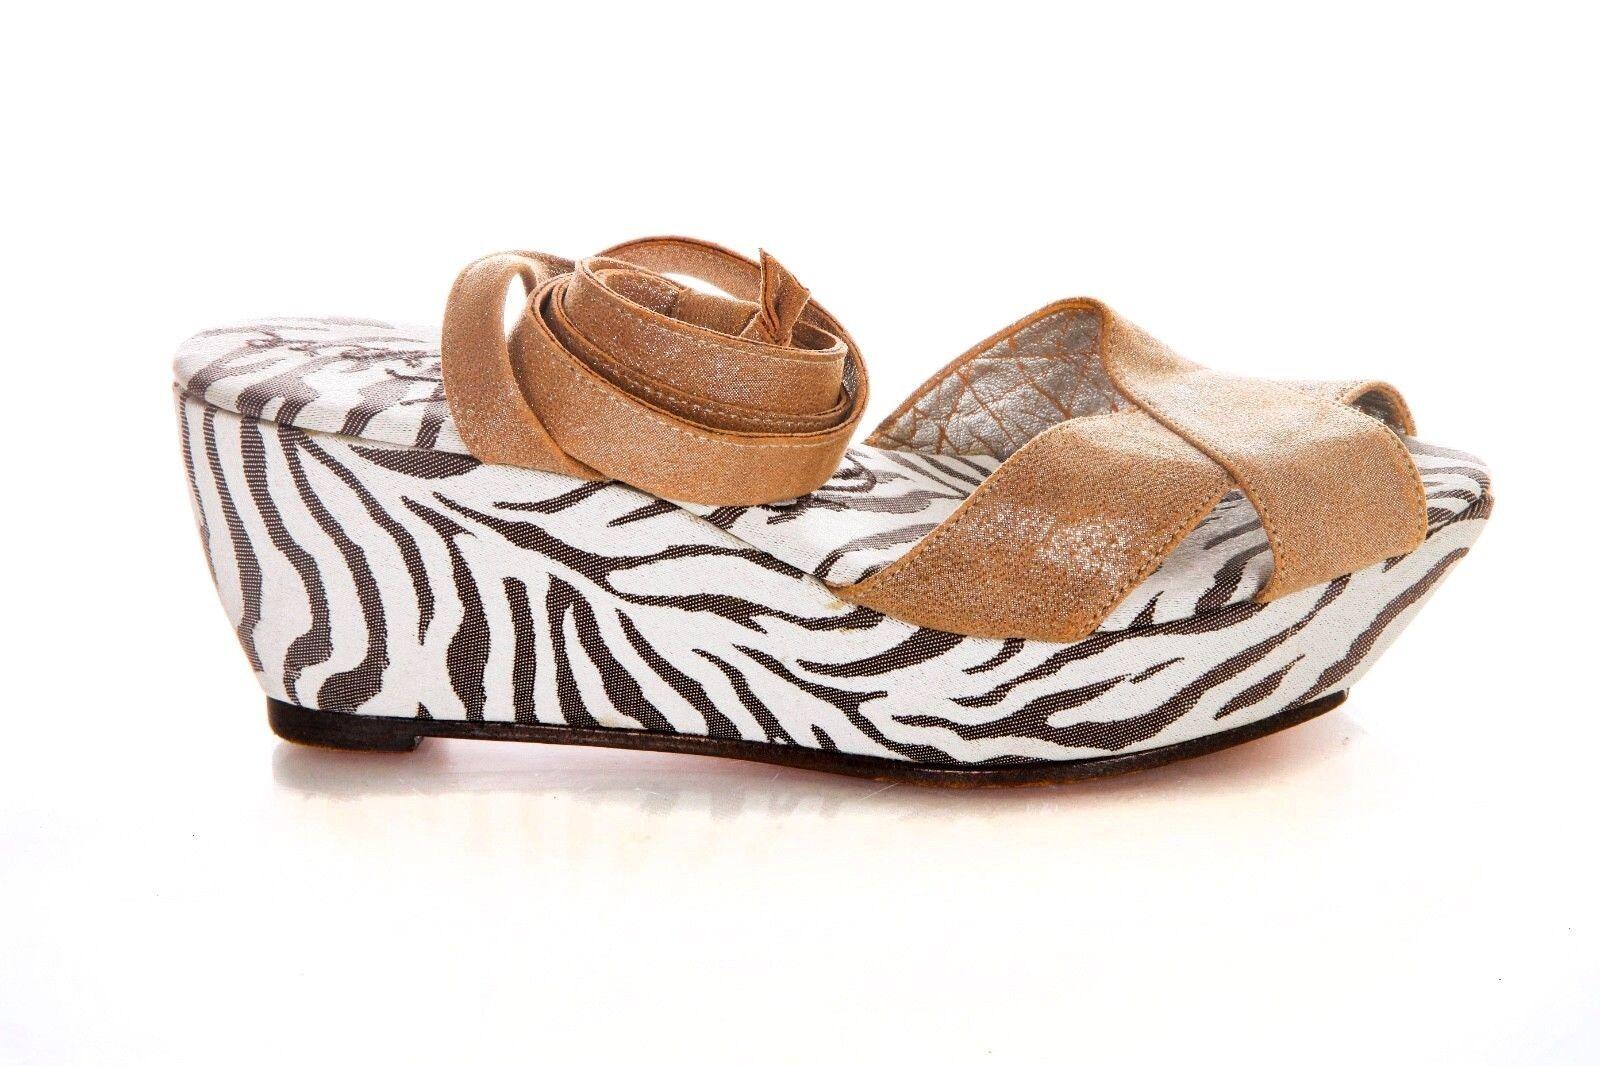 ELISA FERARE Wedges US 6.5 Ivory Beige Tan Zebra Print Metallic Ankle Lace Up